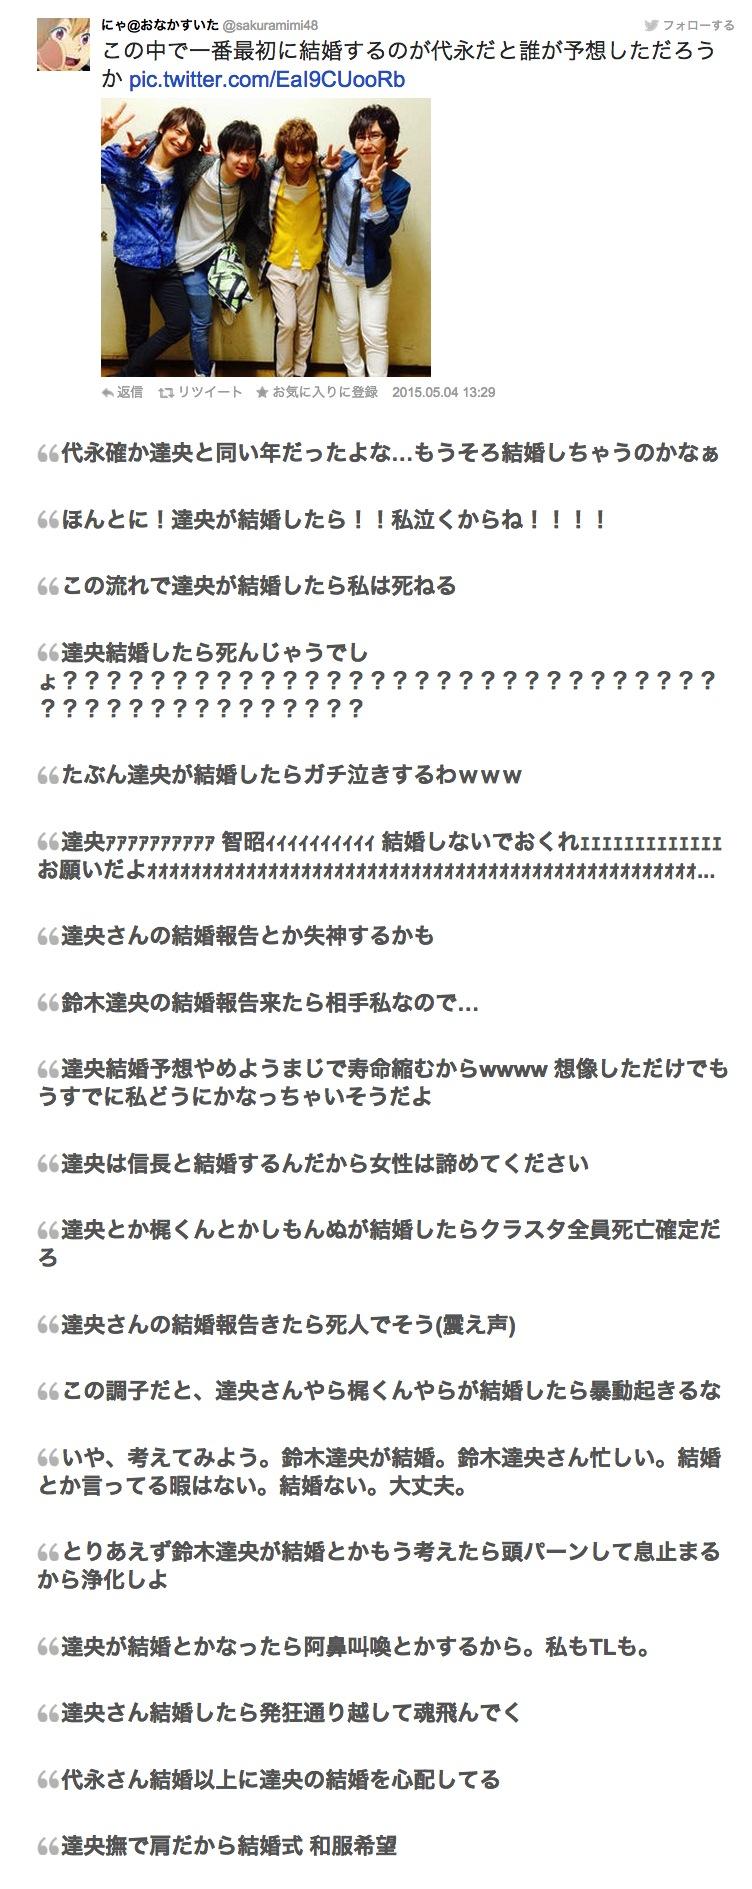 screencapture-matome-naver-jp-odai-2143071148163857701-1430721875861 のコピー